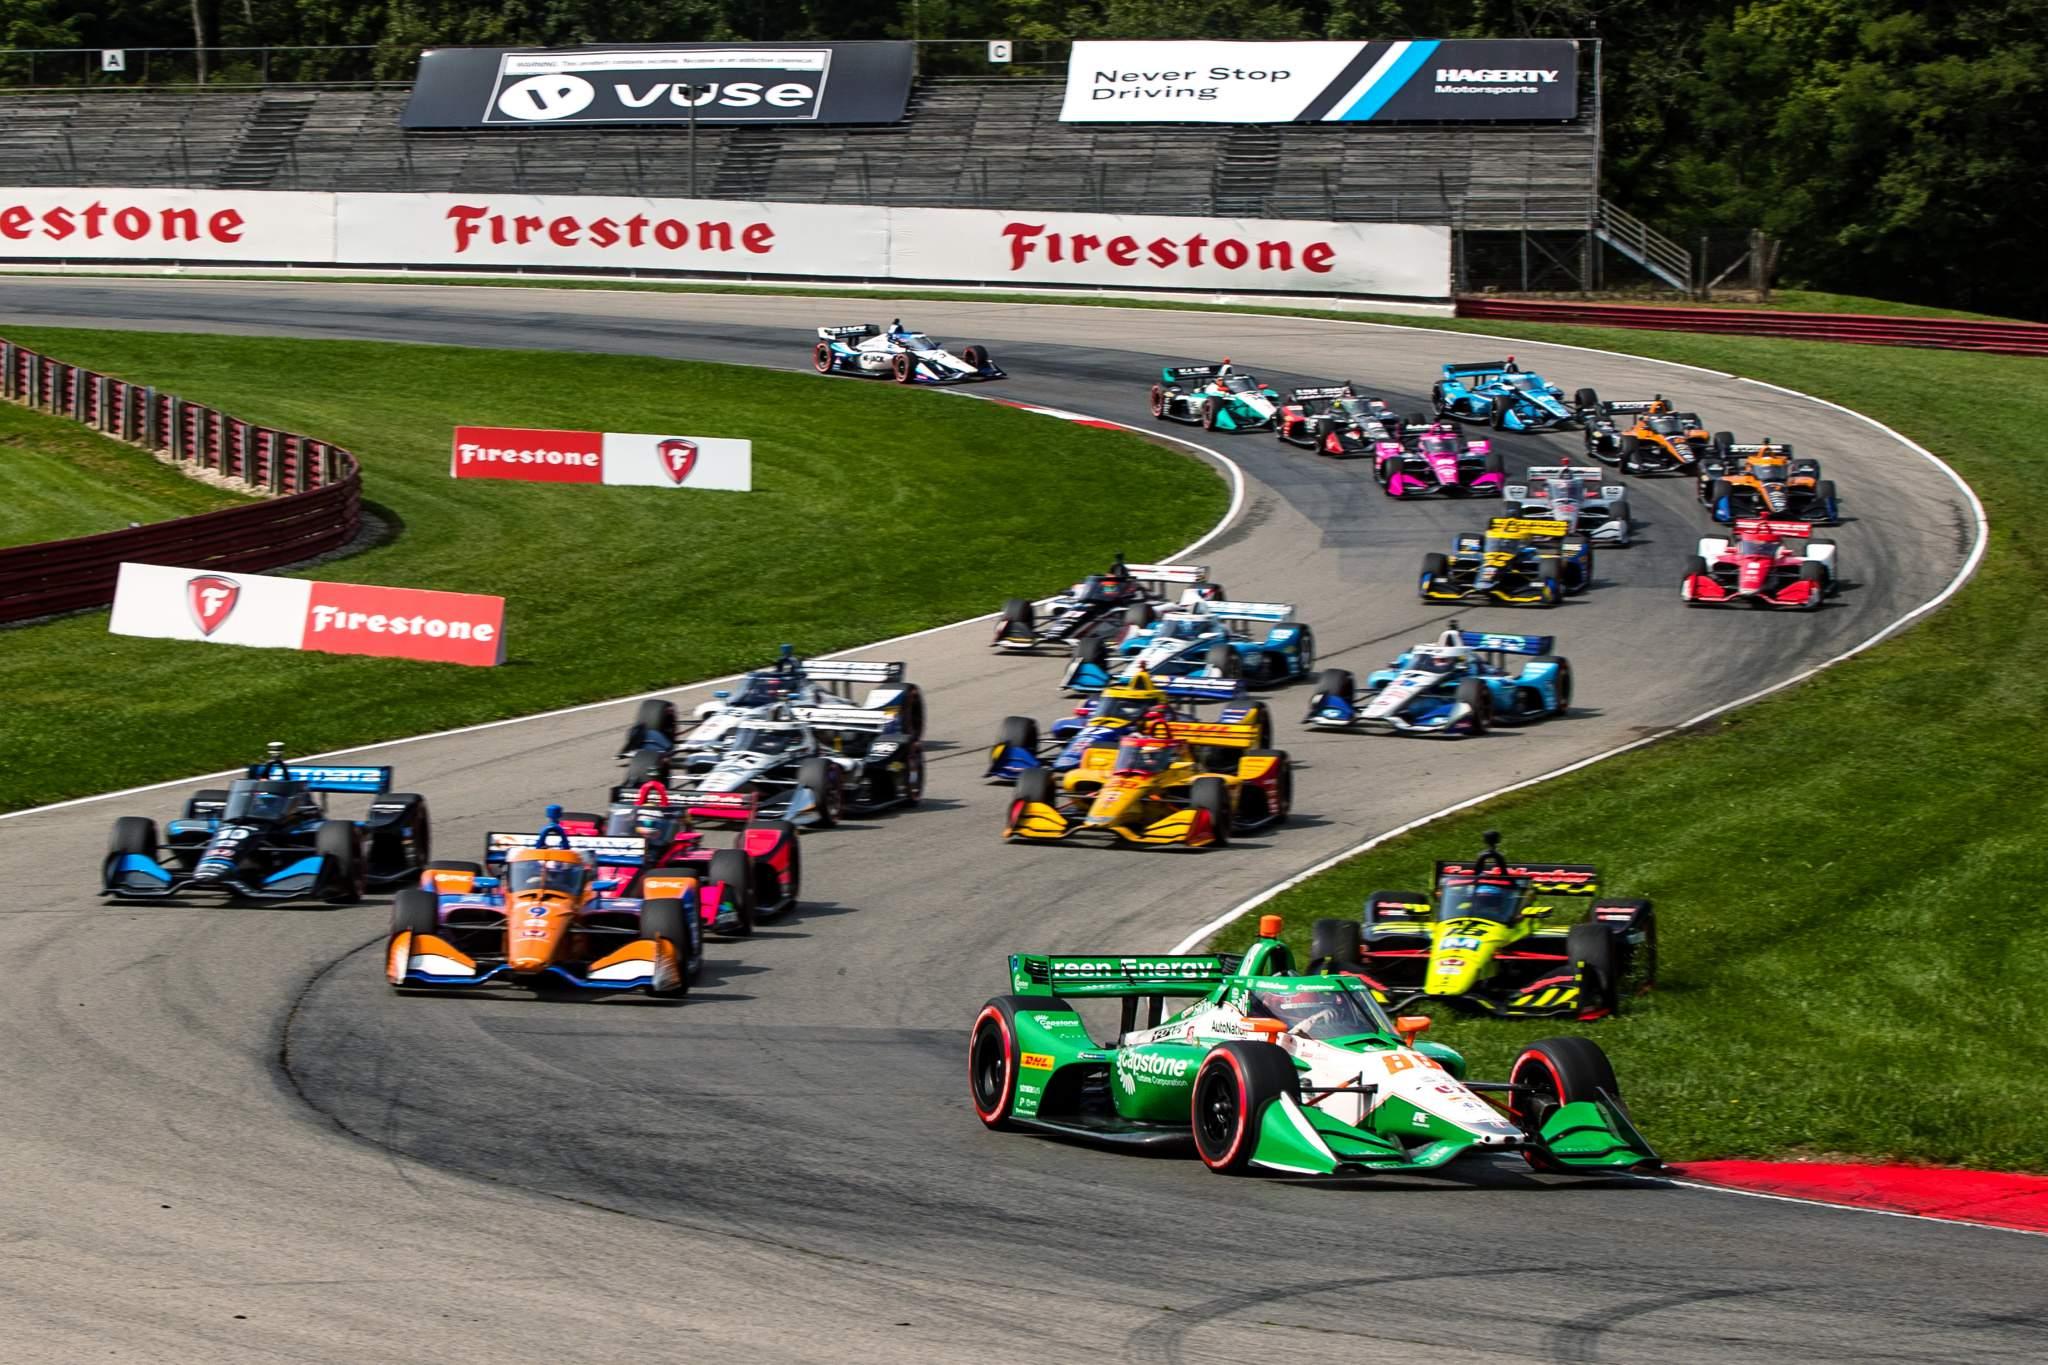 Ntt Indycar Series Honda Indy 200 At Mid Ohio